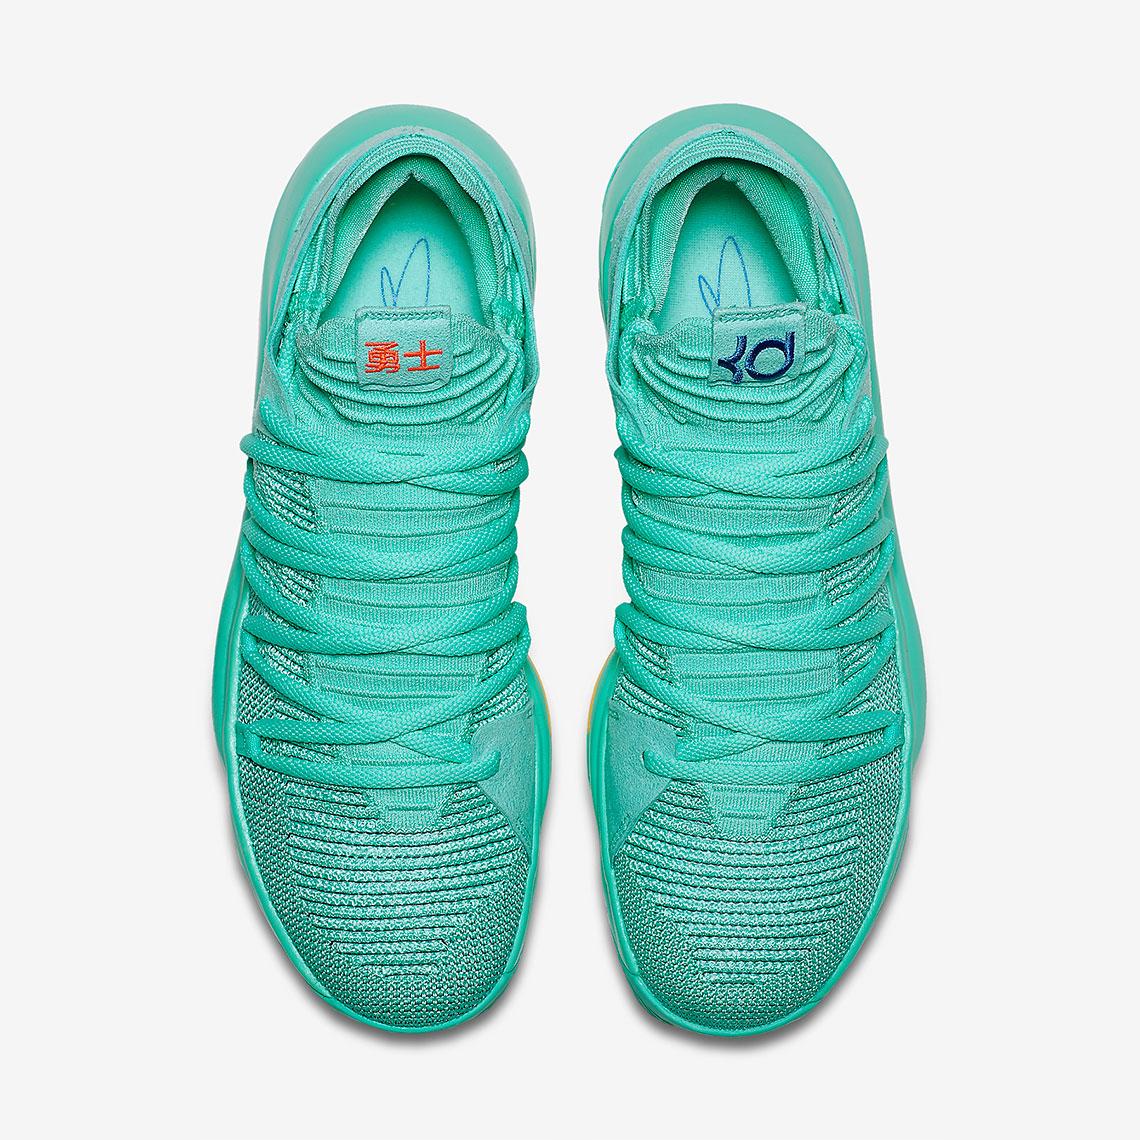 5ccacc9ed8c8 Nike KD 10 City Edition 897816-300